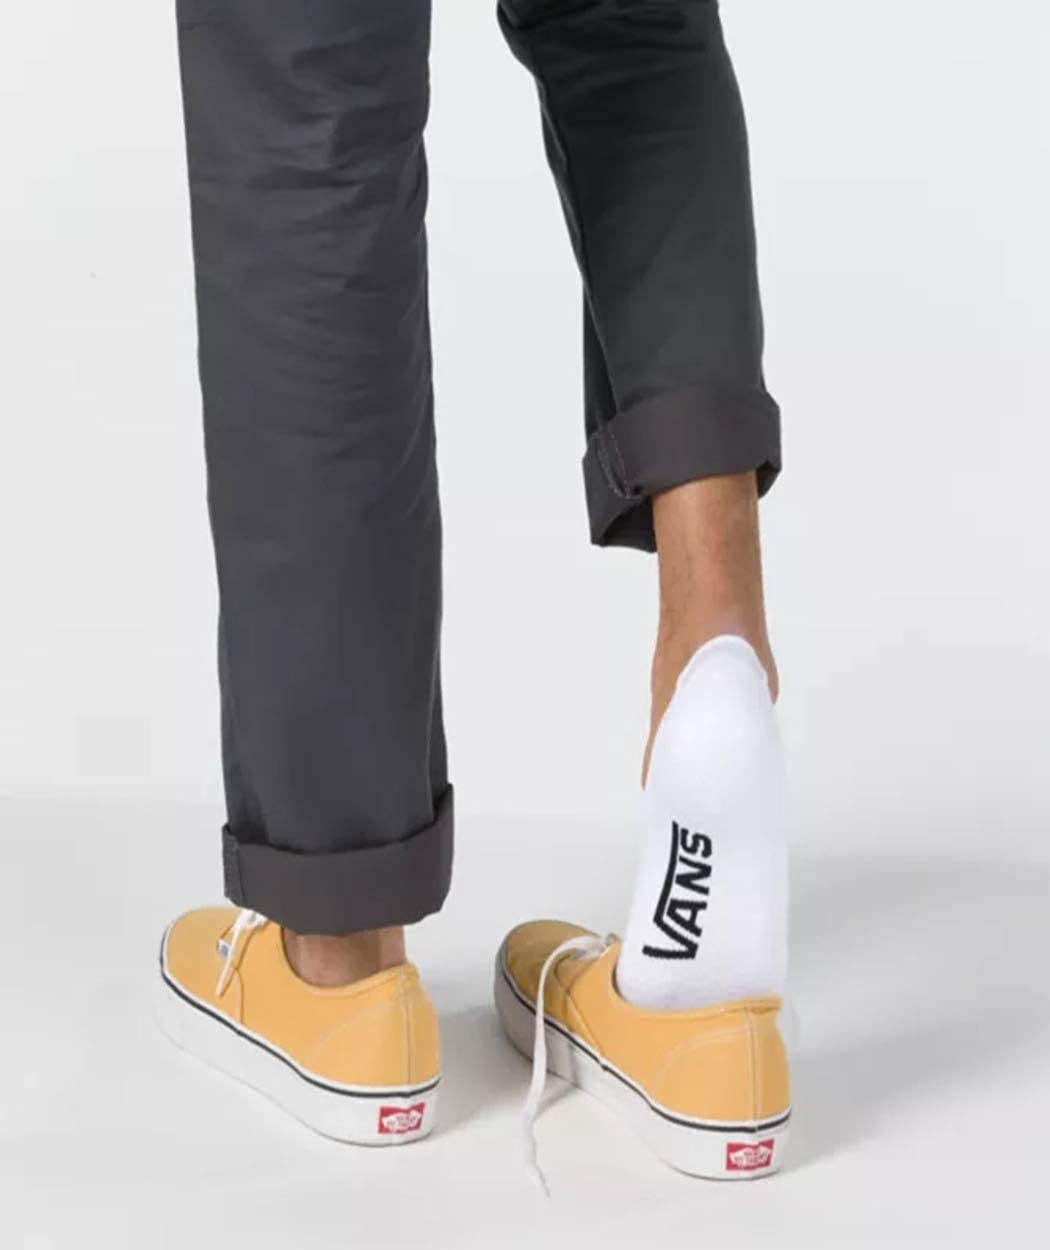 Vans Boys Classic No Show Socks 3-Pack Black/Grey/White VN0A3E2ZJ8Z (Boys 1-6 US/ 31.5-38 EU/ 13.5-5 UK/ 19-24 CM)